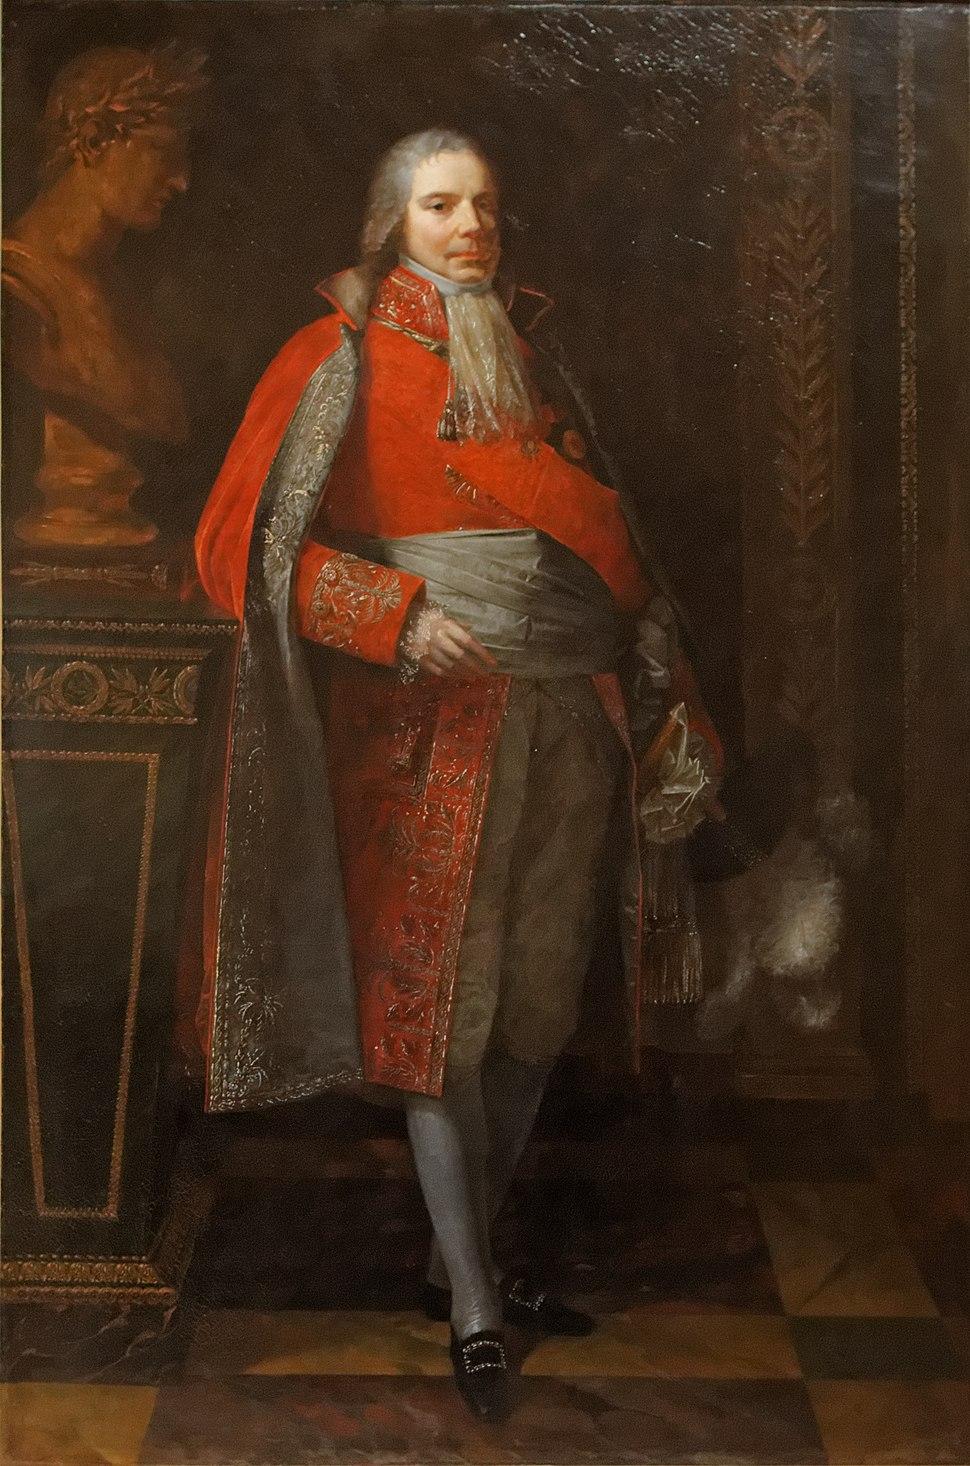 Charles-Maurice de Talleyrand-Périgord, prince de Bénévent by Pierre-Paul Prud'hon, musée Carnavalet 02